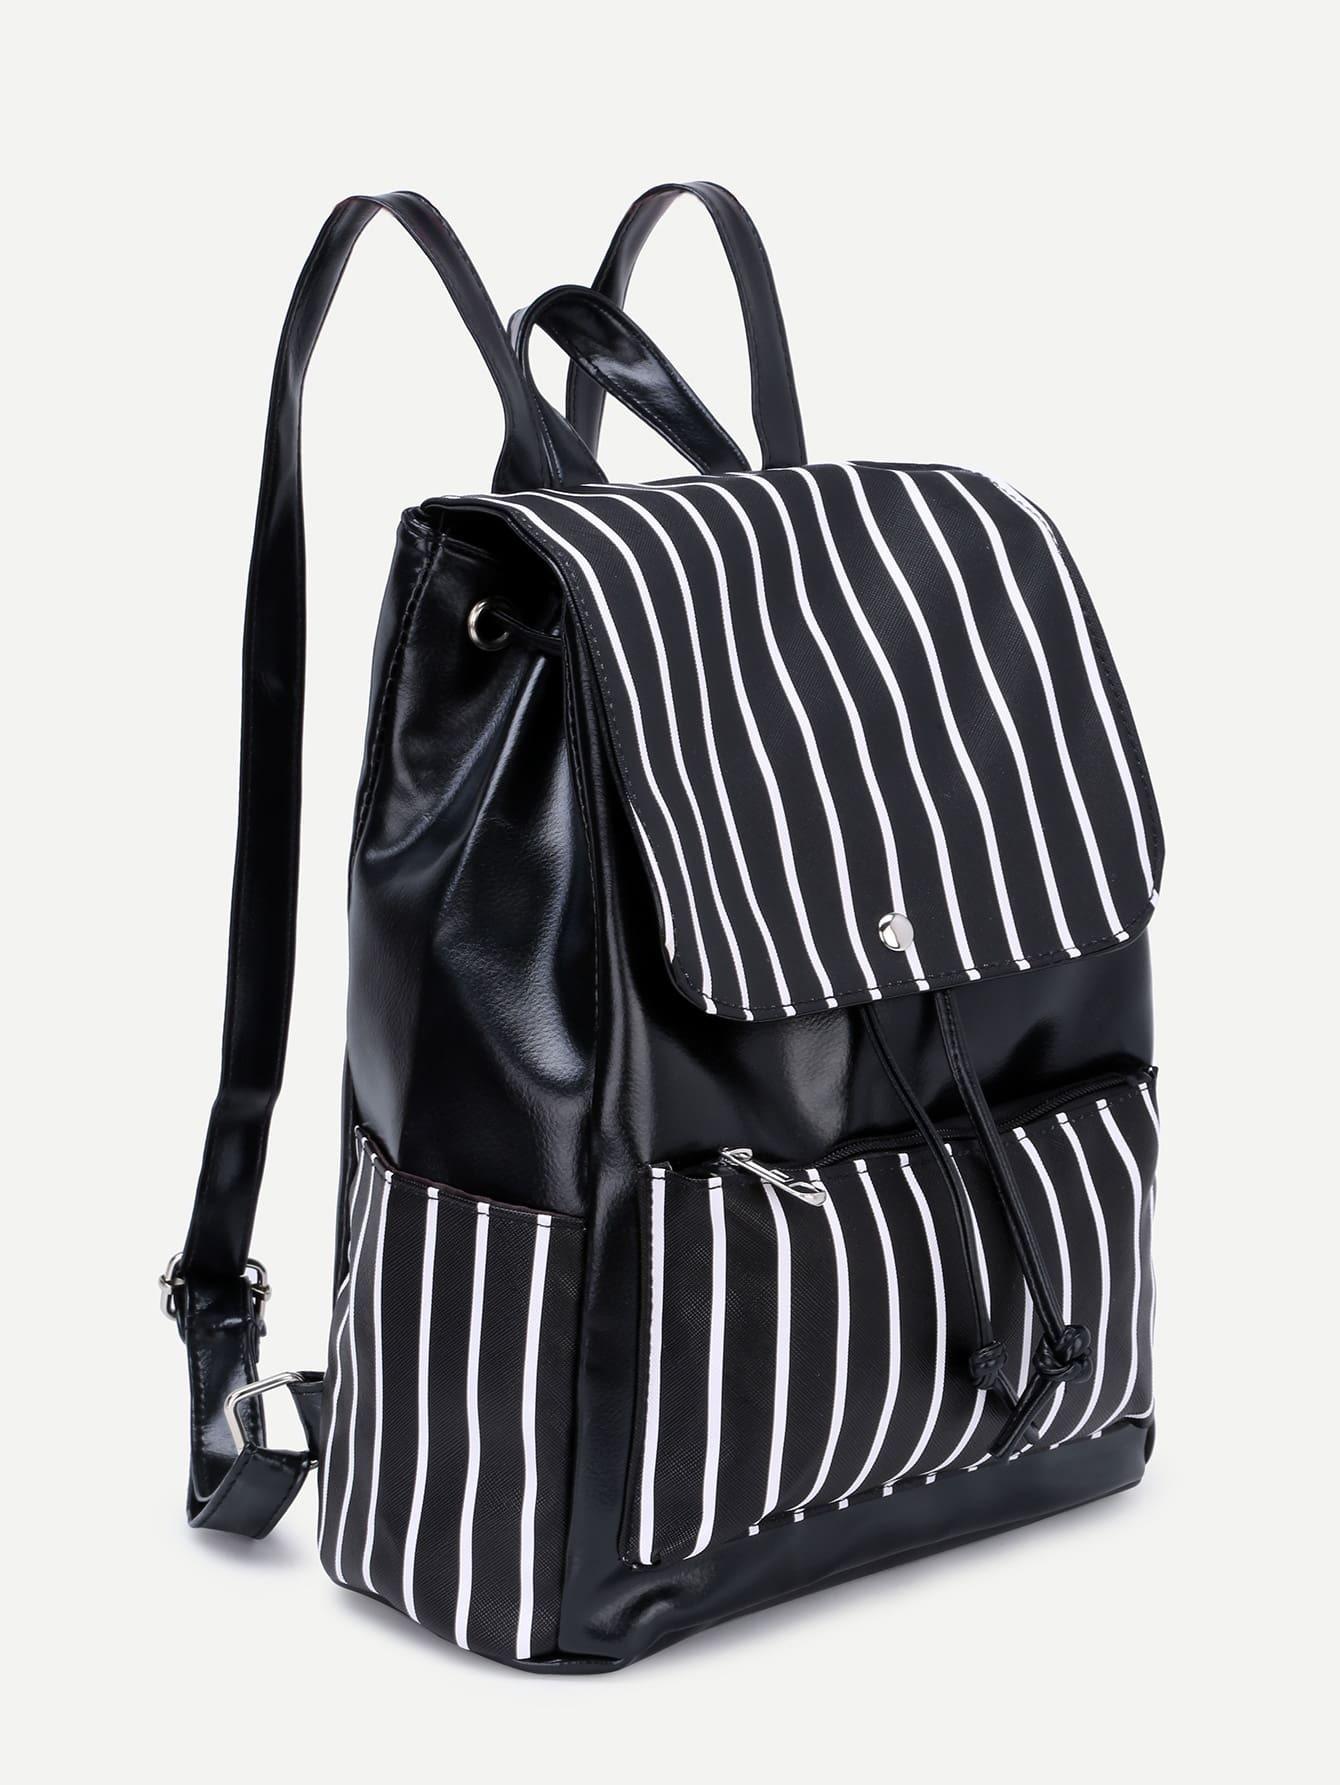 bag160819920_2